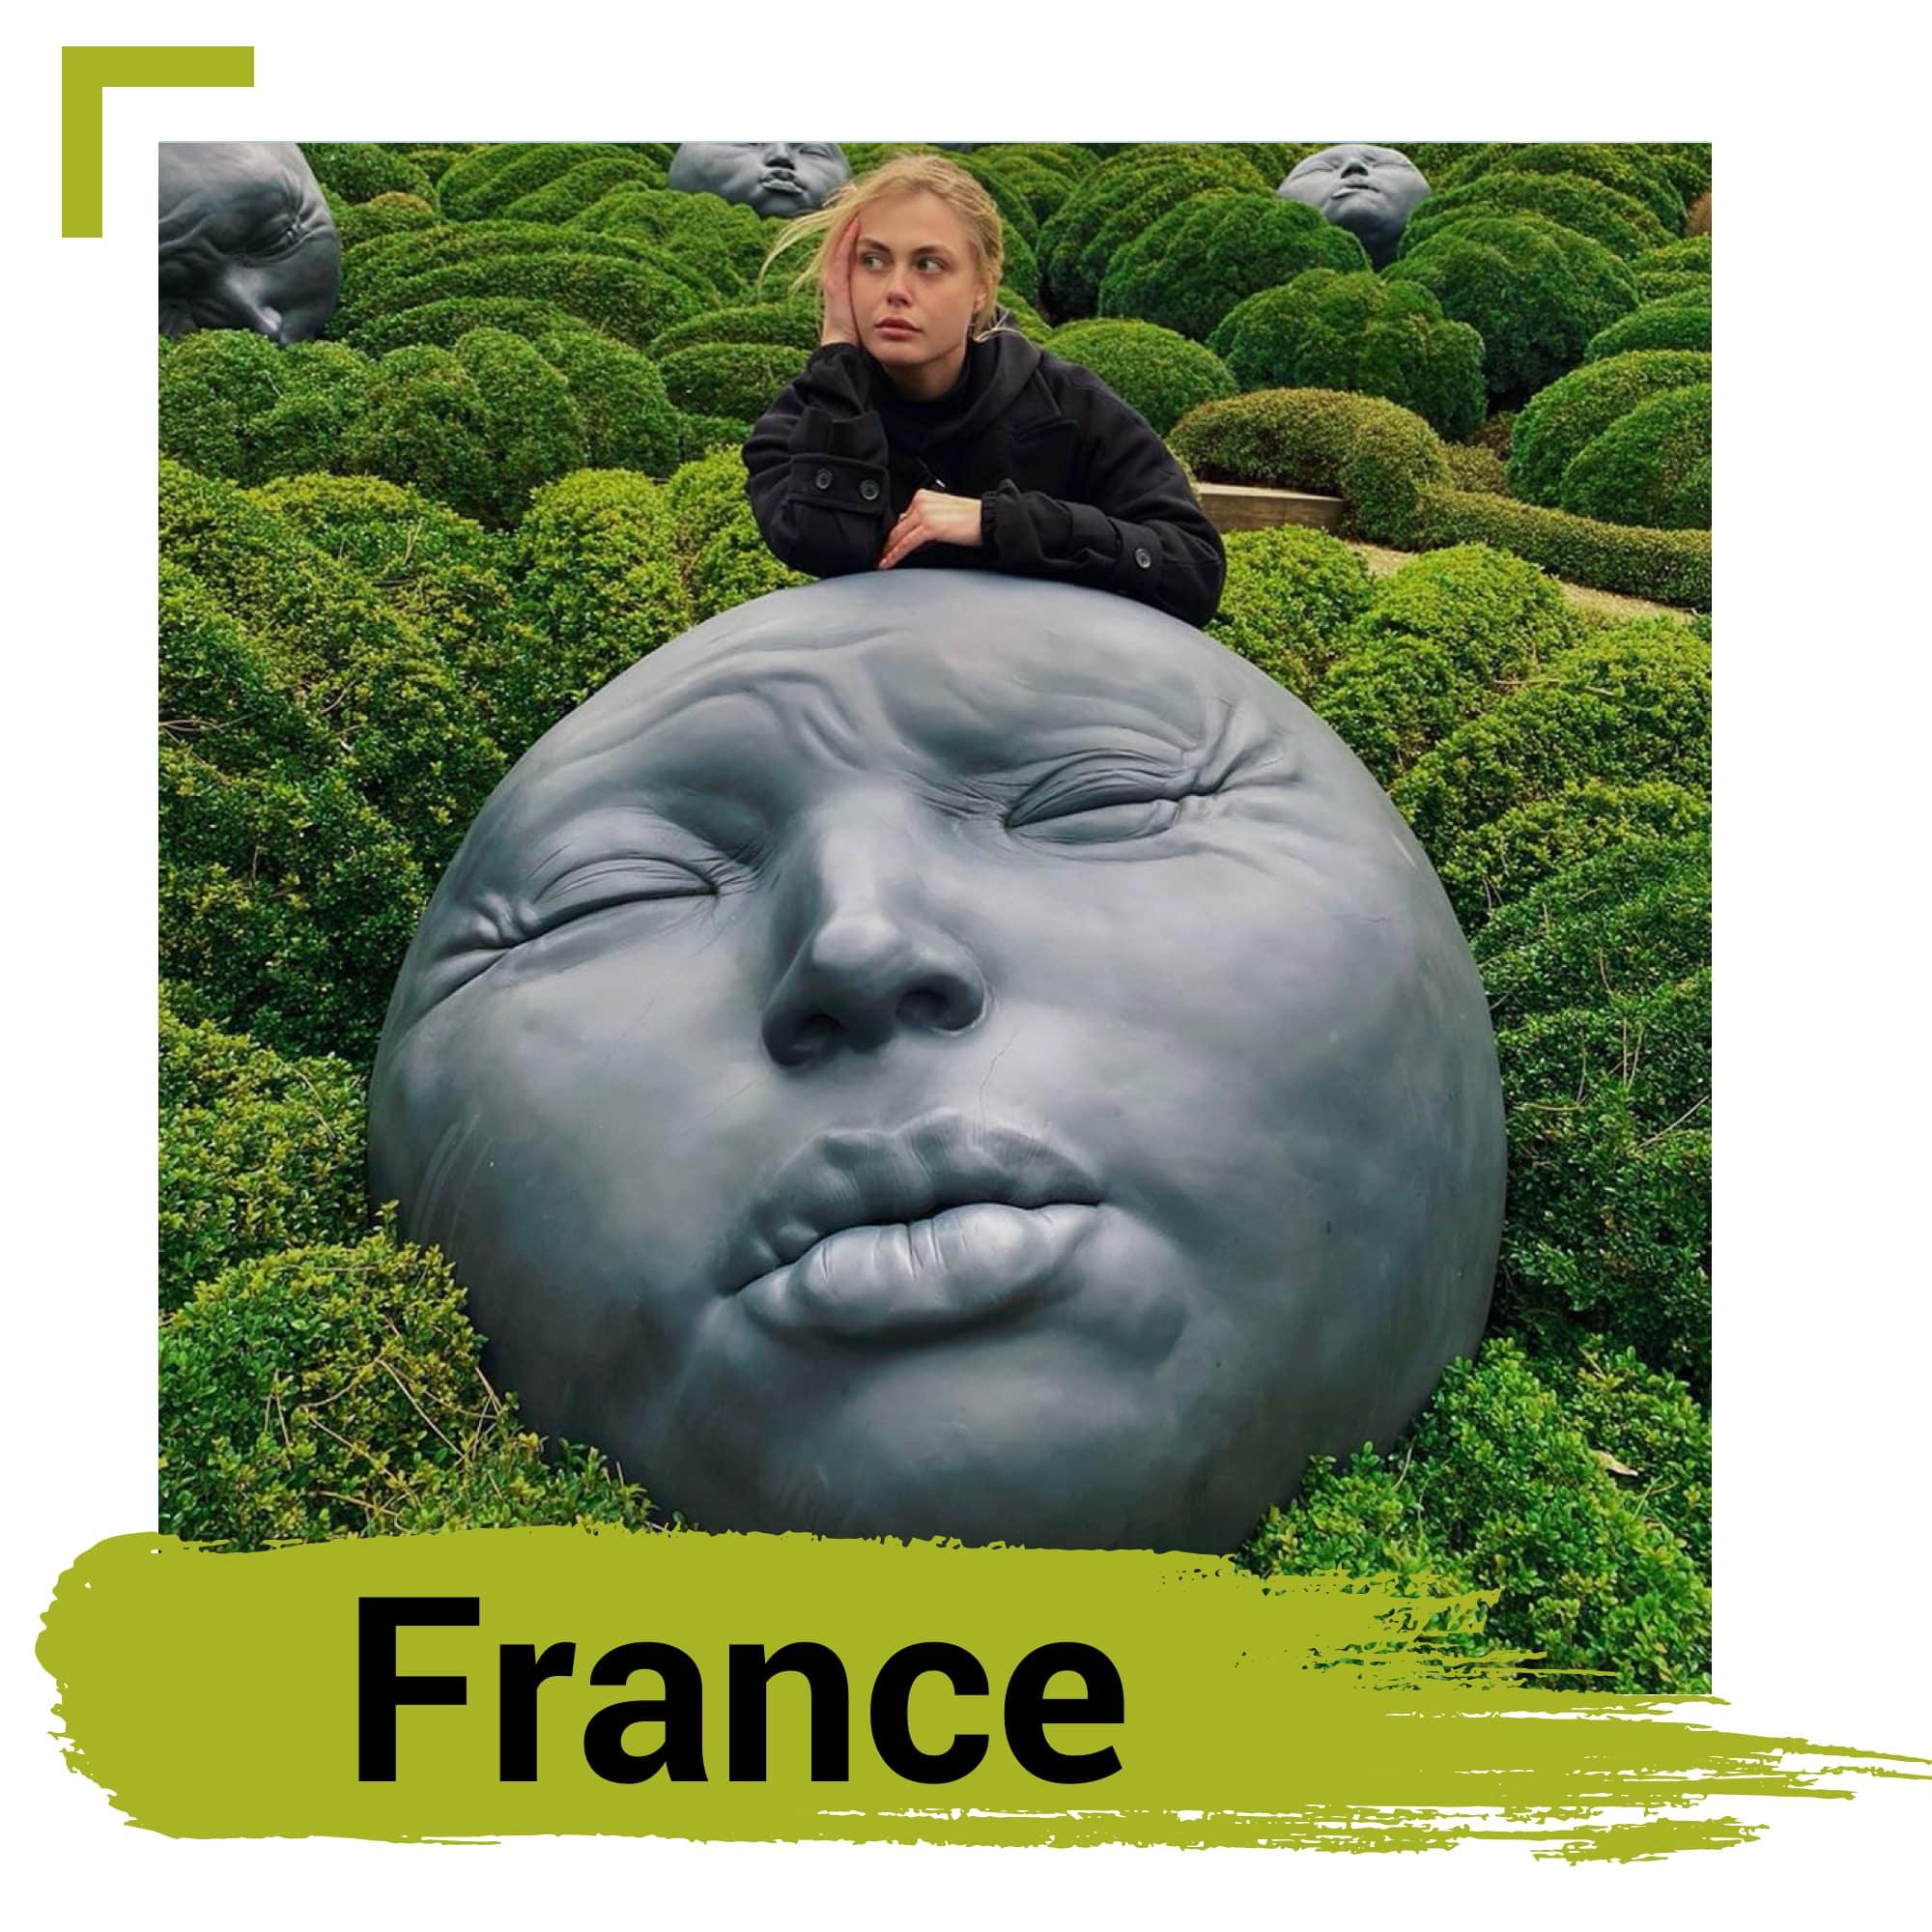 Les Jardines D'Etretat in France